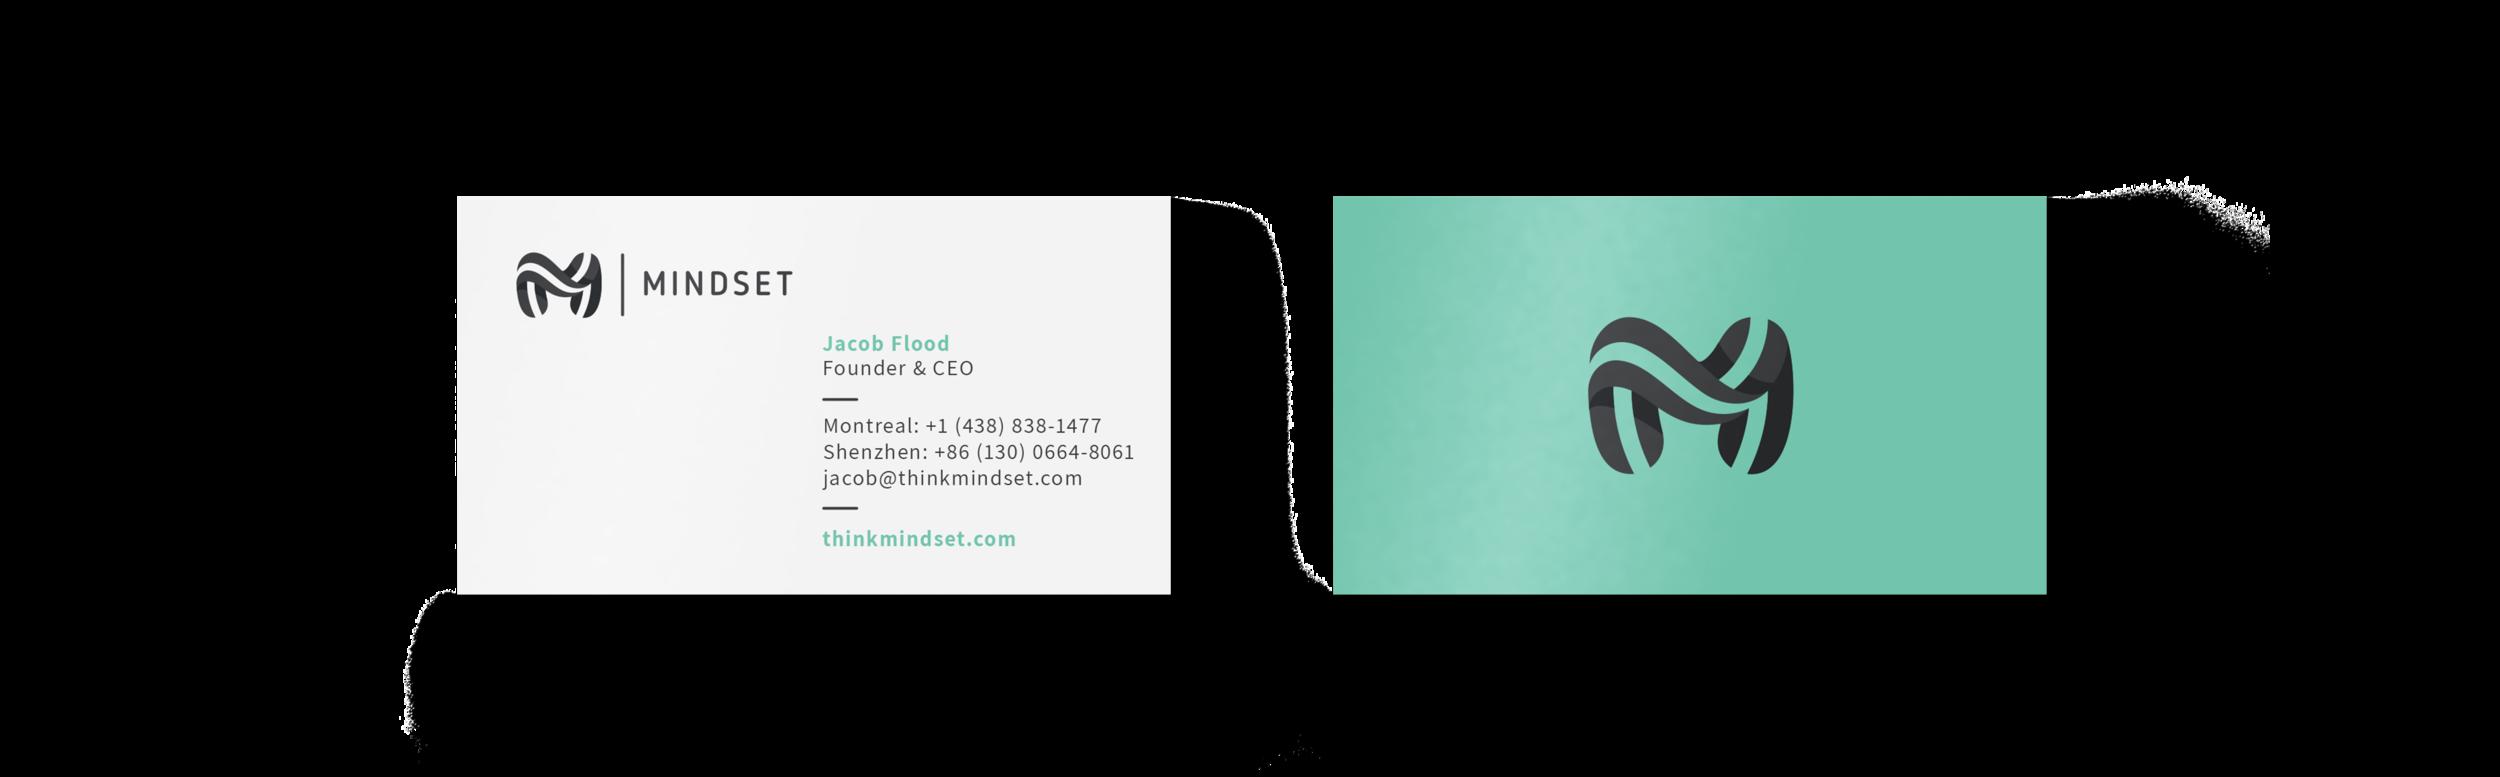 business card mockup_1.png